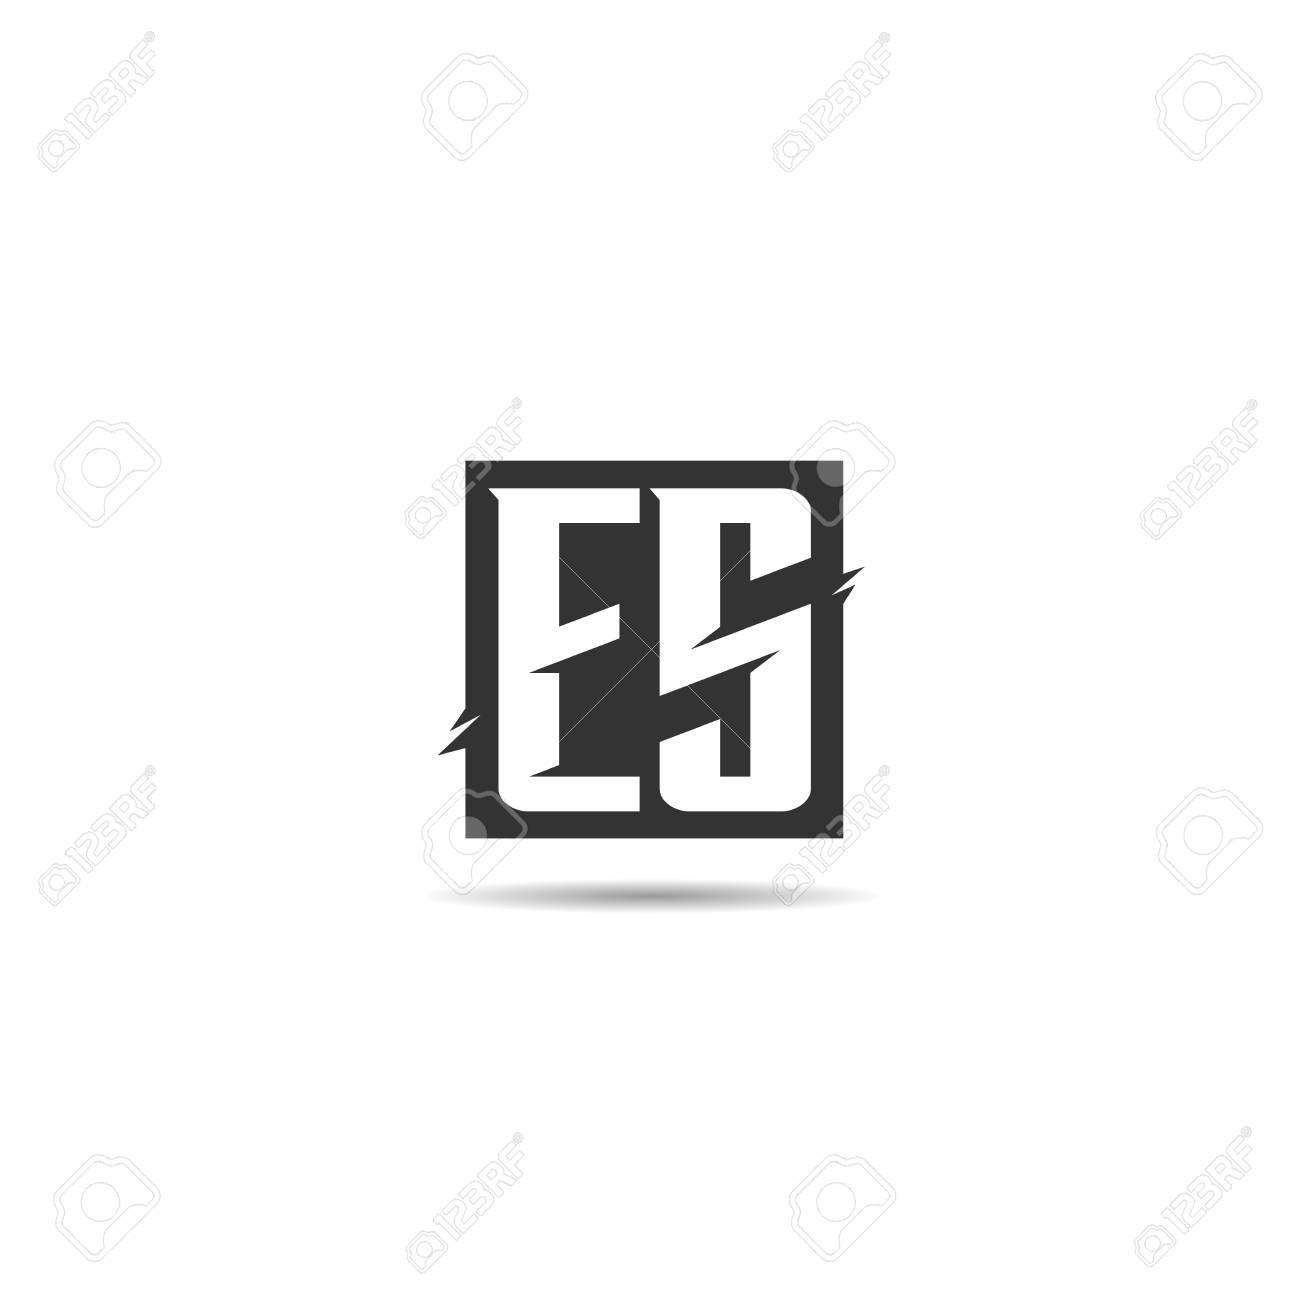 Initial Letter ES Logo Template Design - 108066408